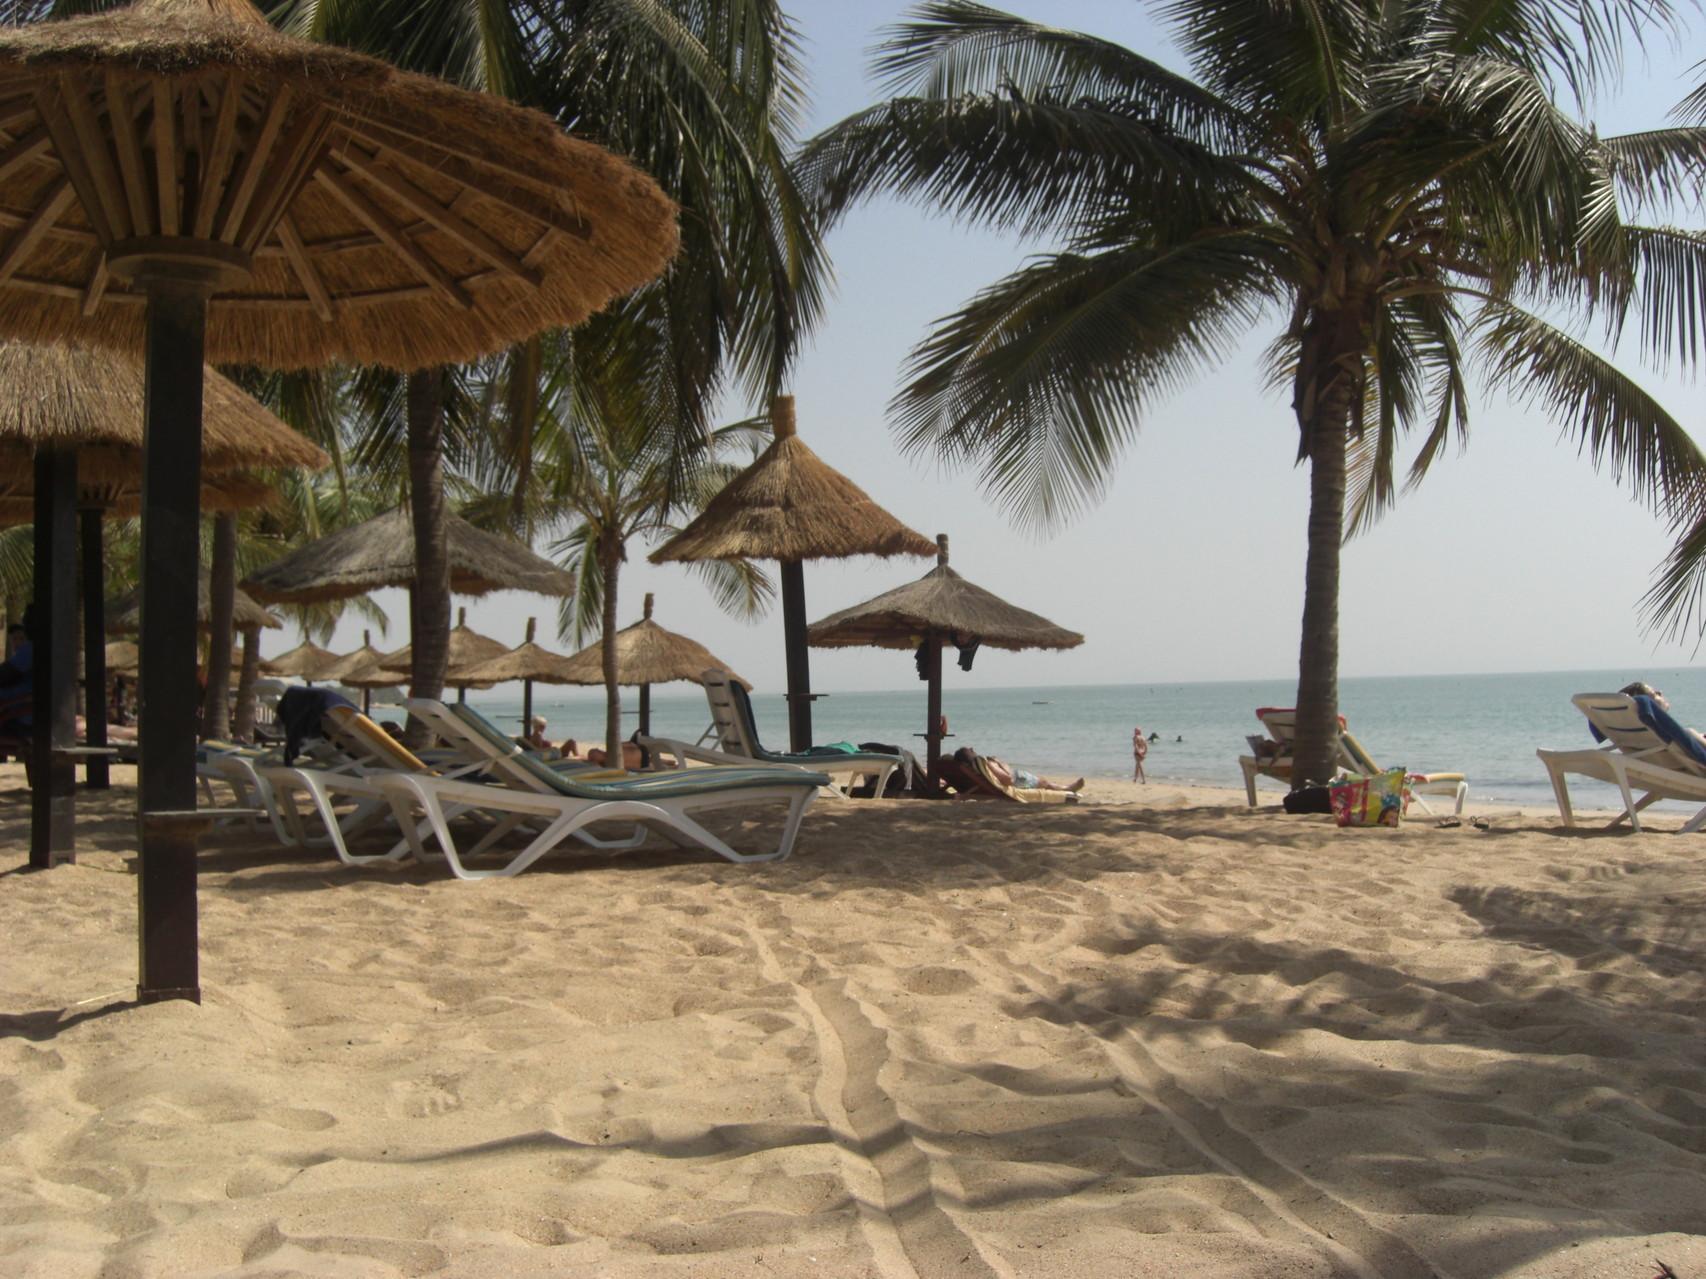 La plage de Saly